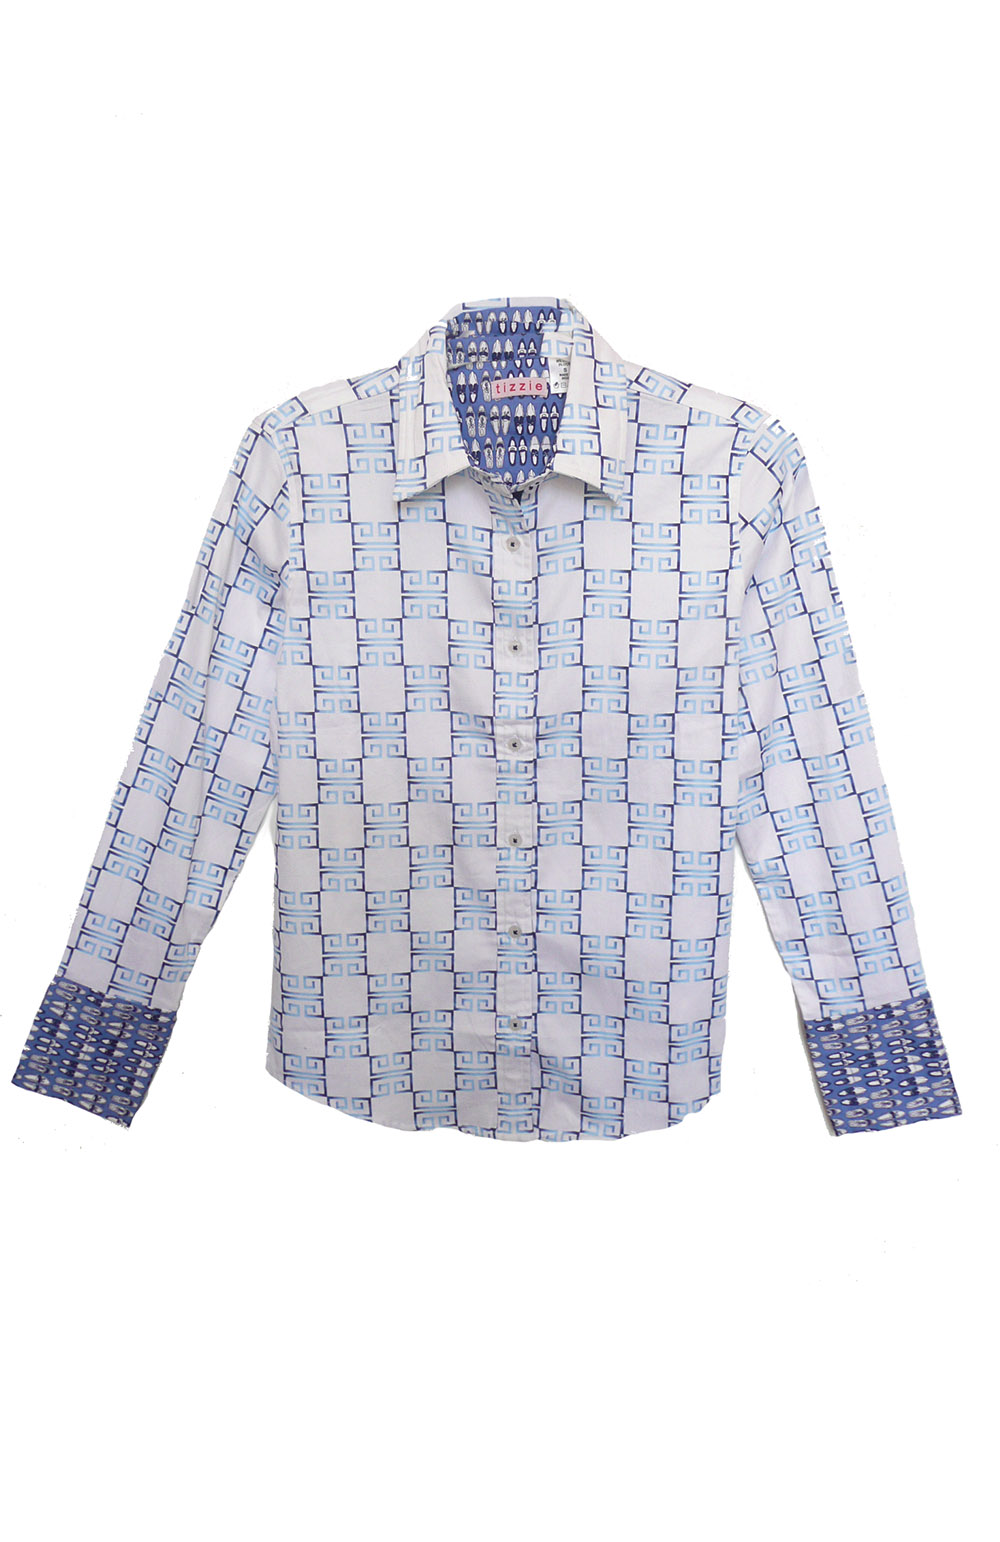 bls blu plaid cott shirt.jpg